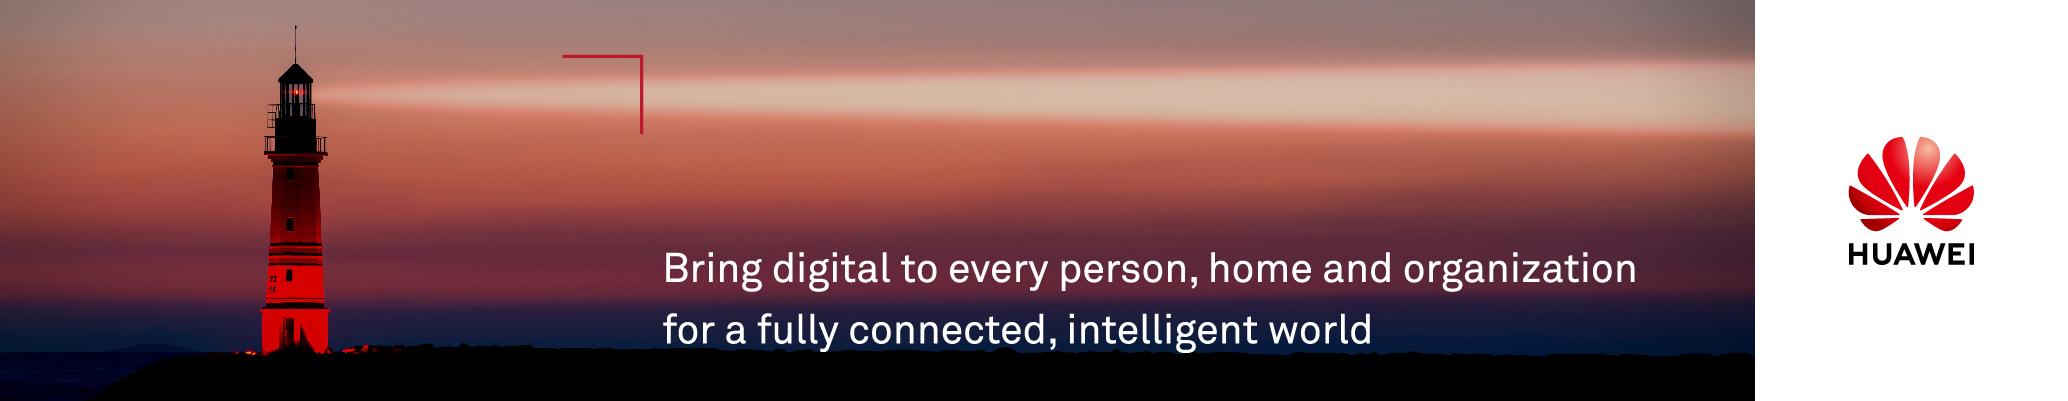 2019 04 Huawei Website